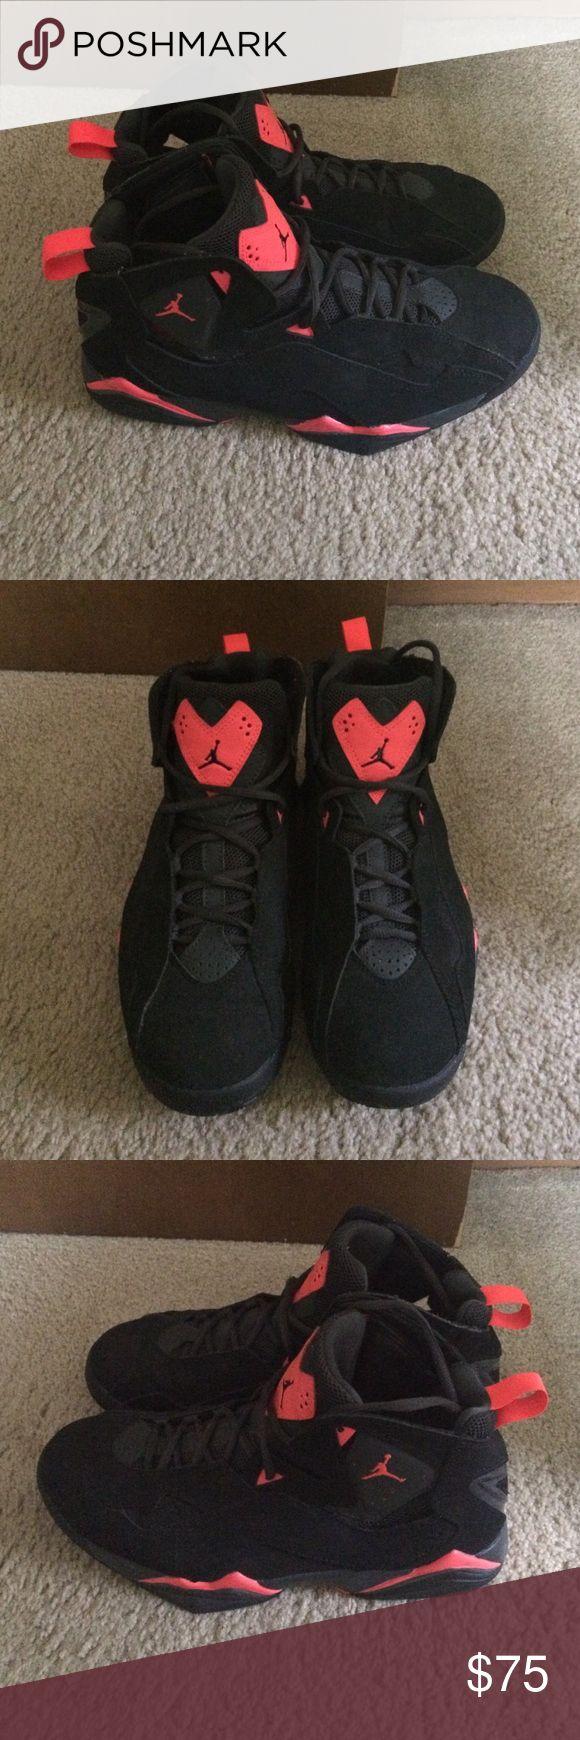 Air Jordan True Flight Air Jordan True flight size 9 (mens) worn 5 times Jordan Shoes Athletic Shoes